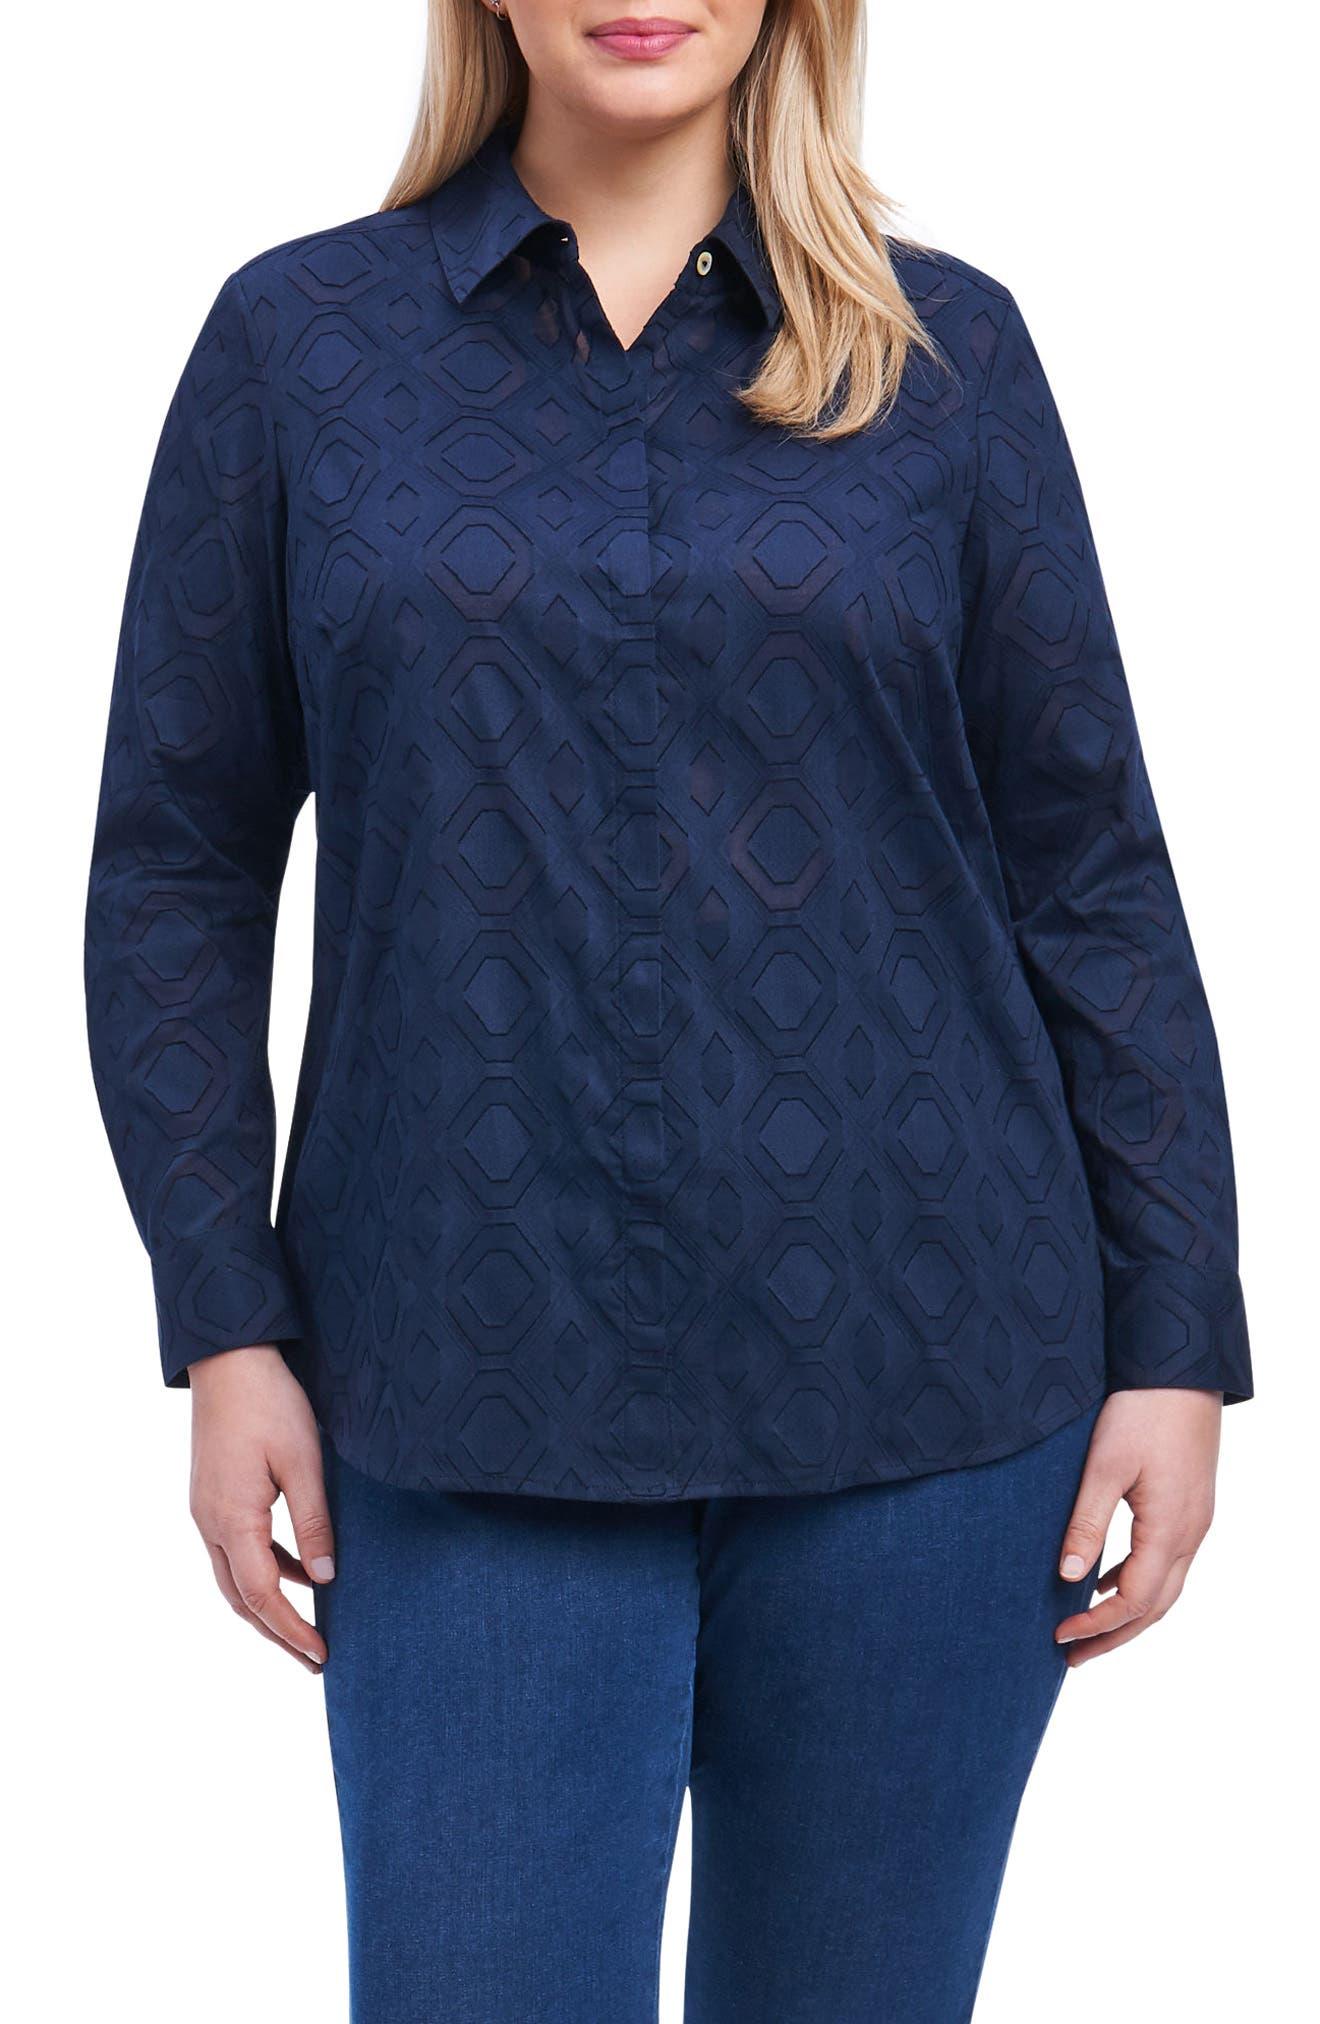 Main Image - Foxcroft Ava Diamond Clip Jacquard Shirt (Plus Size)